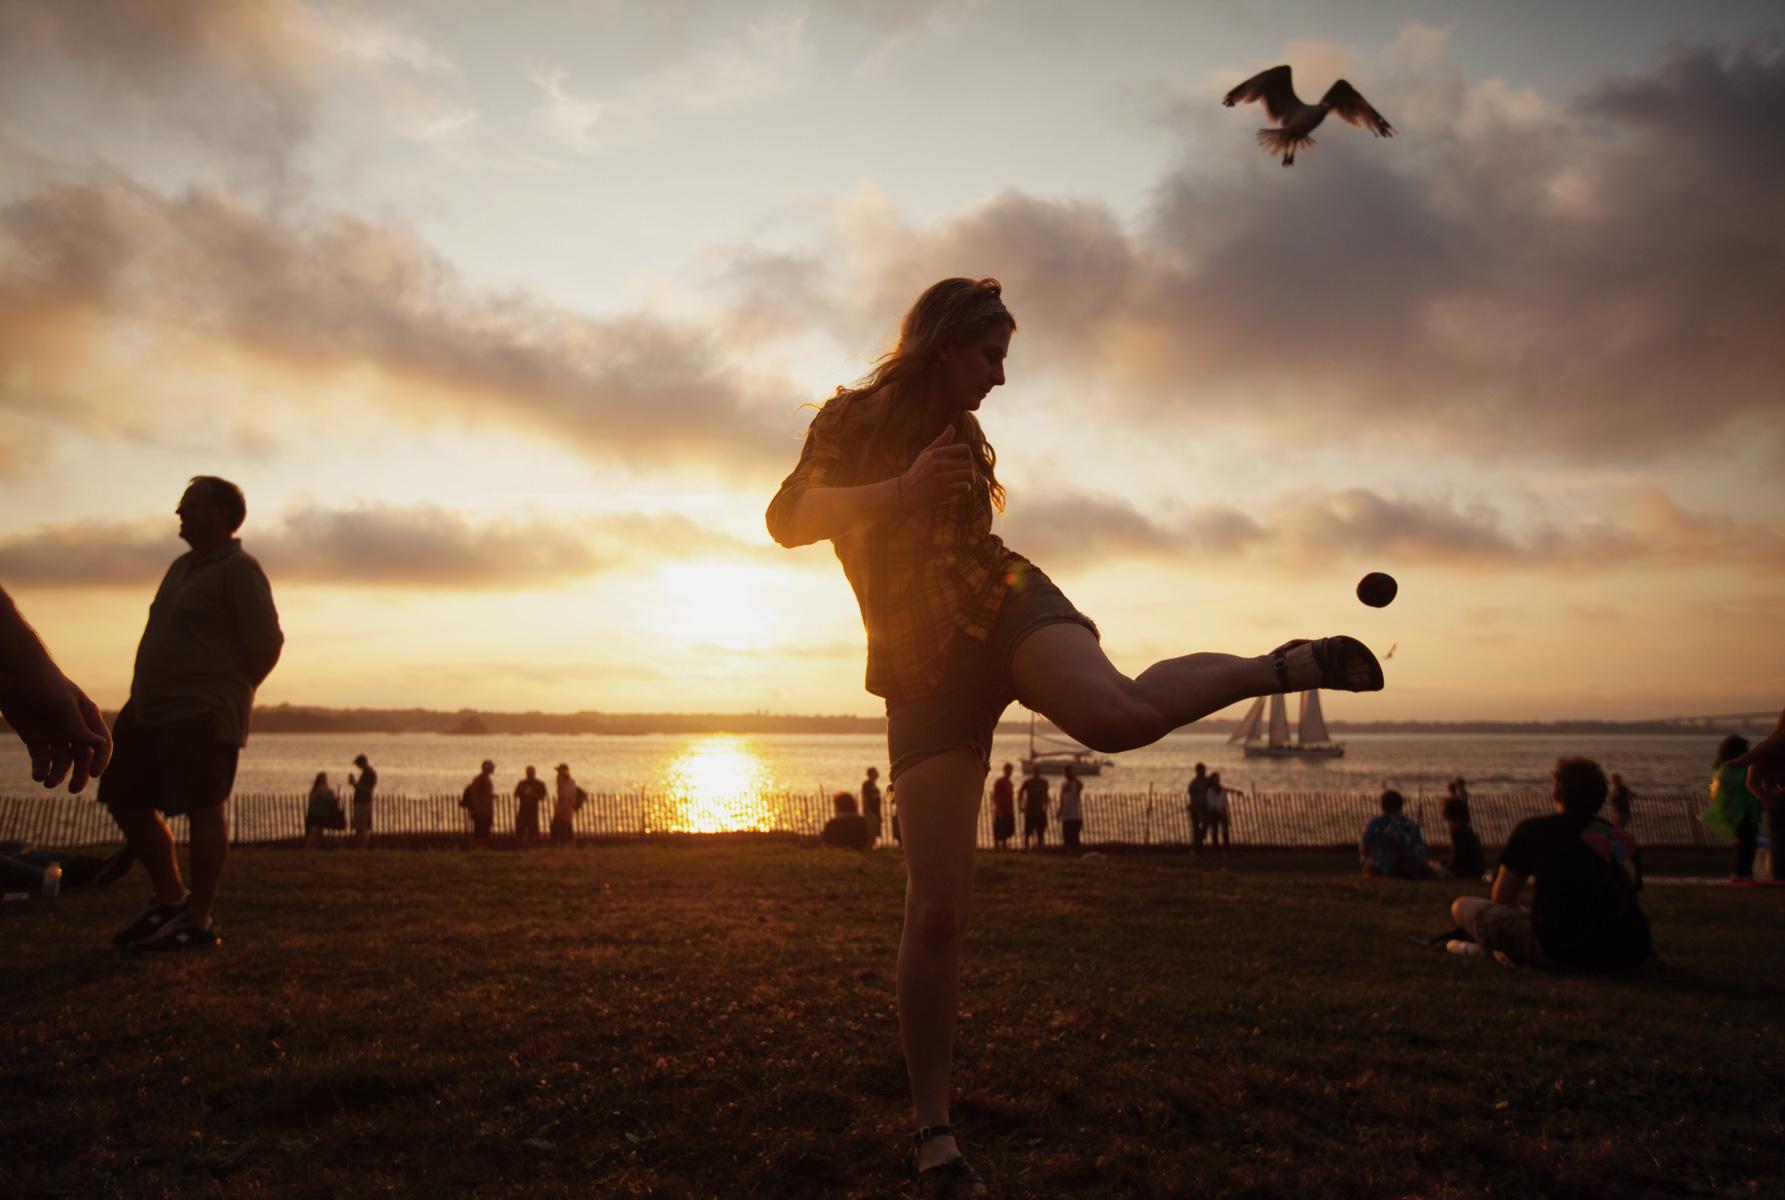 hacky-sack-sunset-beach-1.jpg